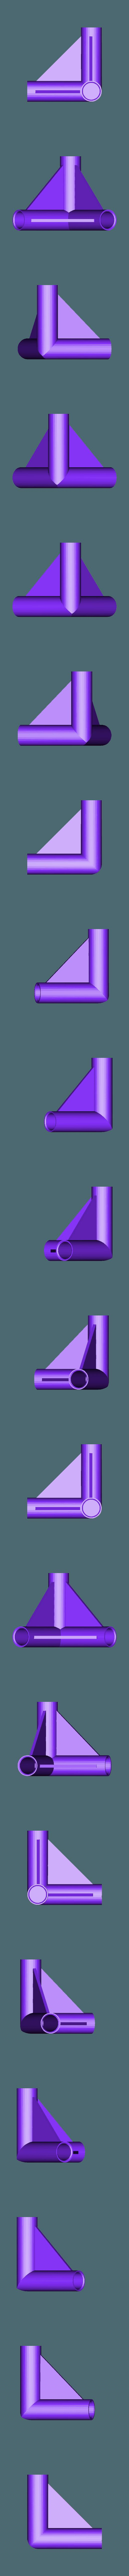 Eckst%C3%BCck.stl Download free STL file Corner connector for garden tent • 3D printer template, gobo38